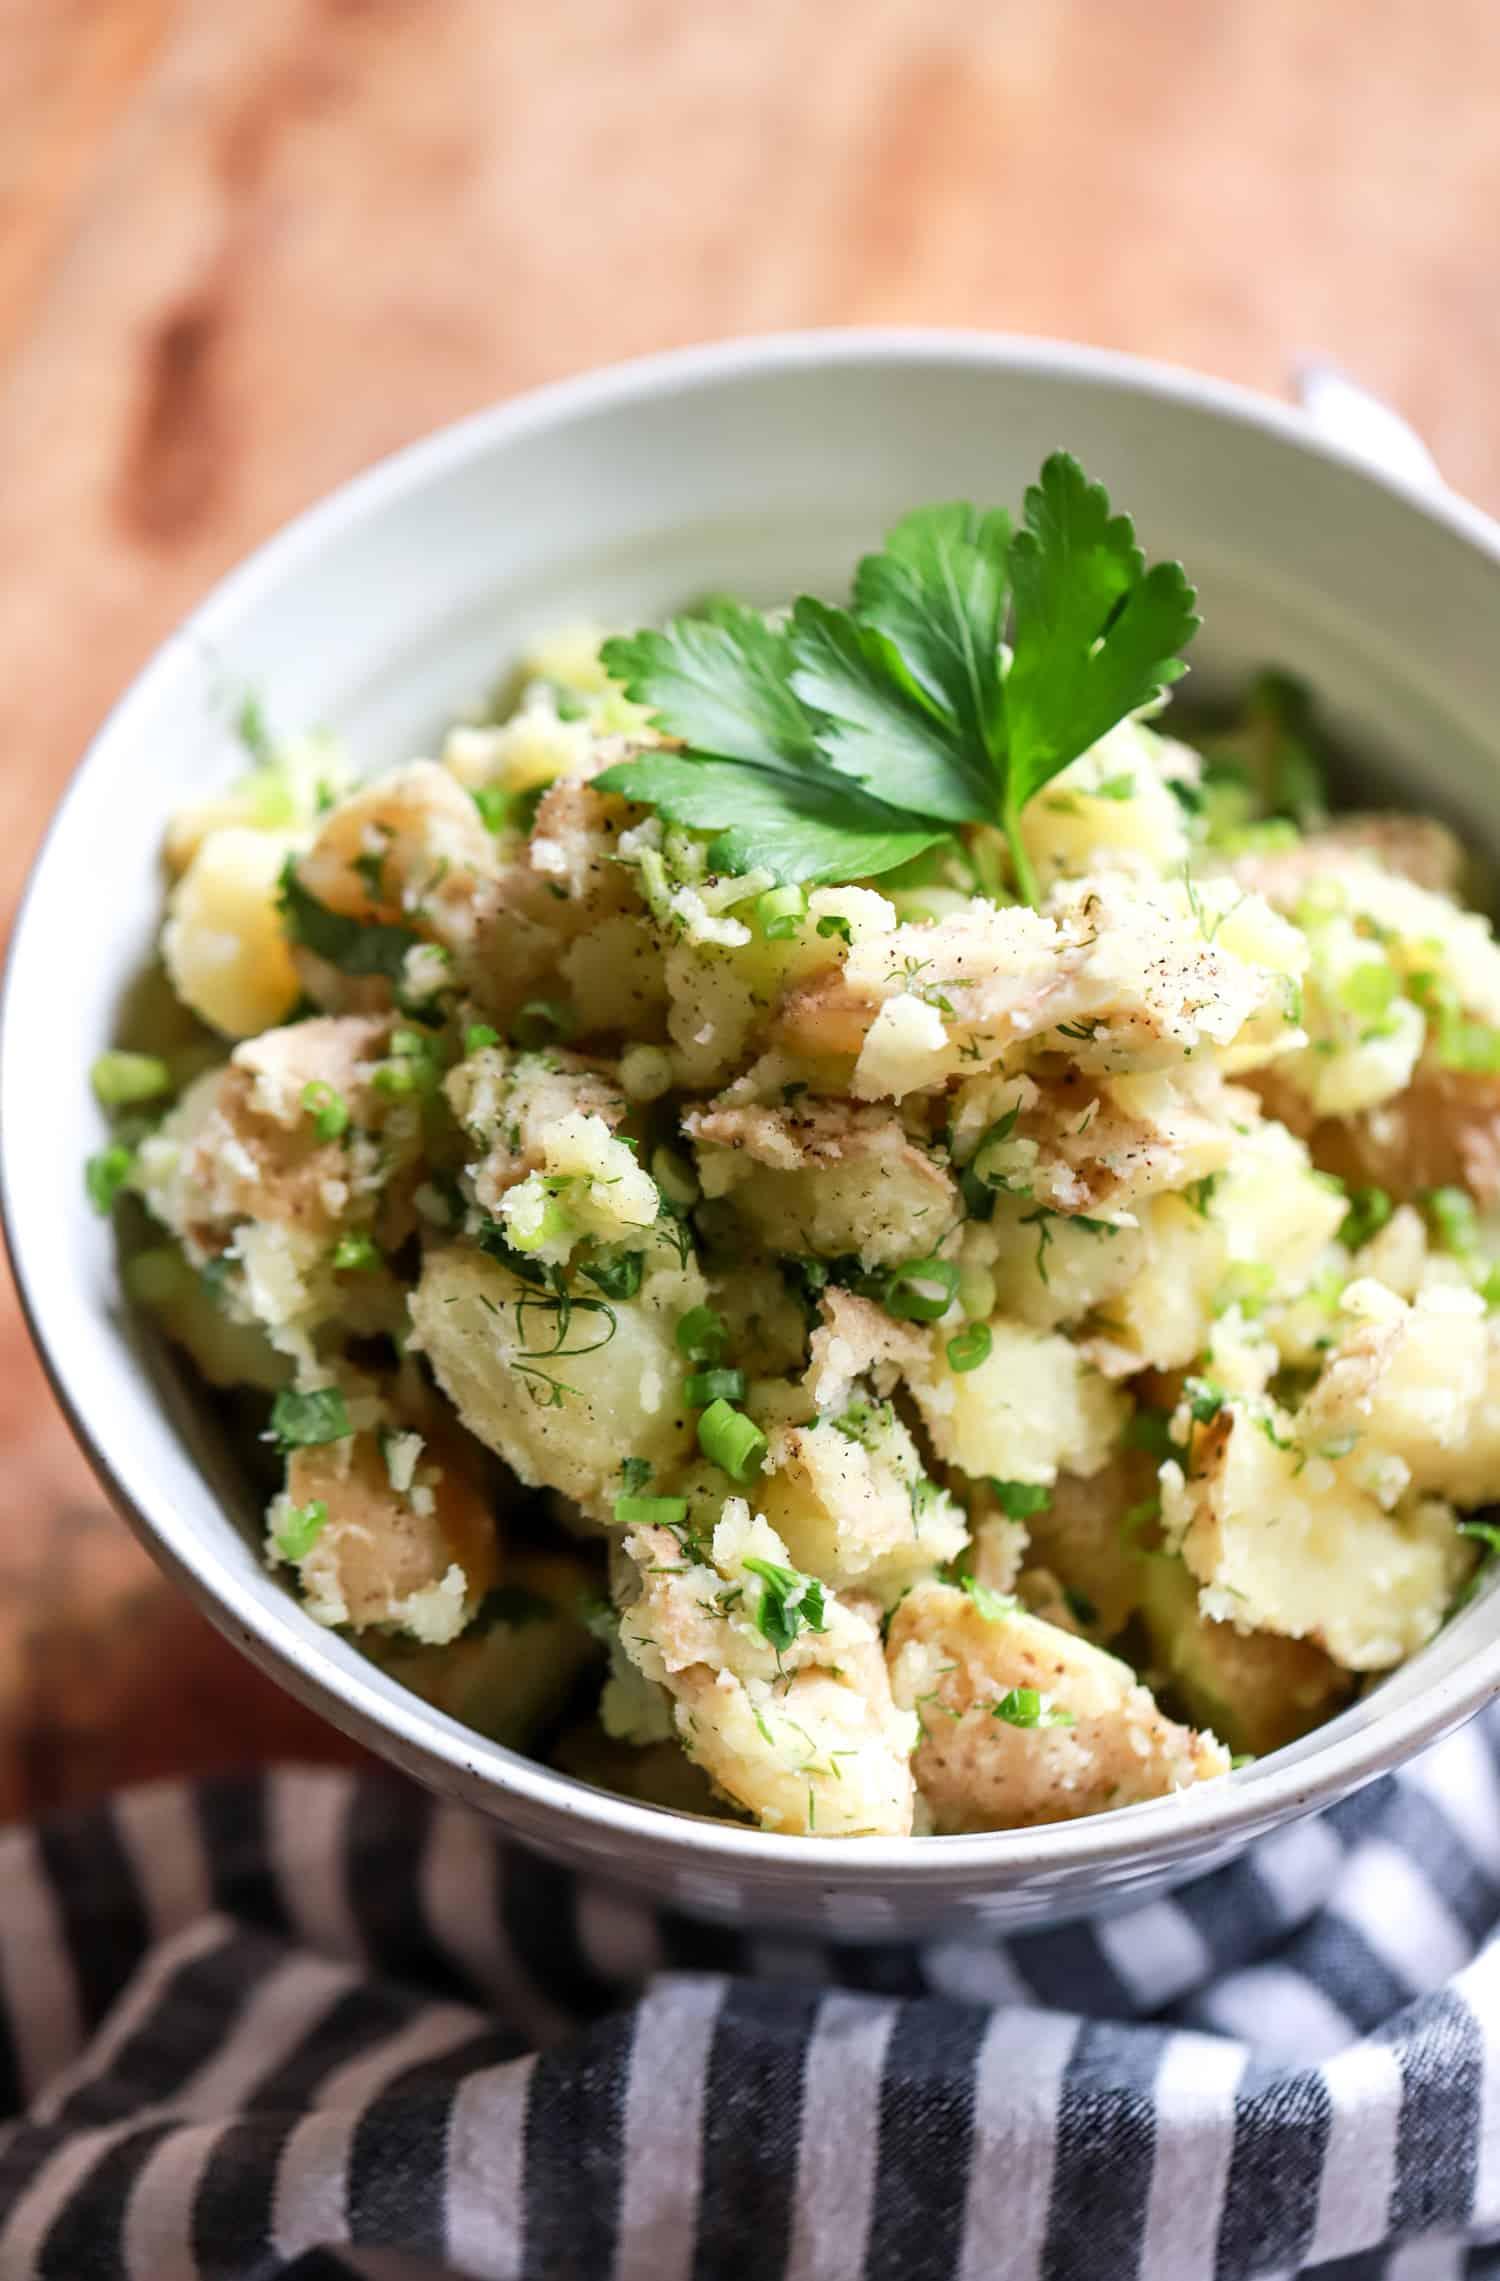 vegan potato salad in a bowl with striped napking